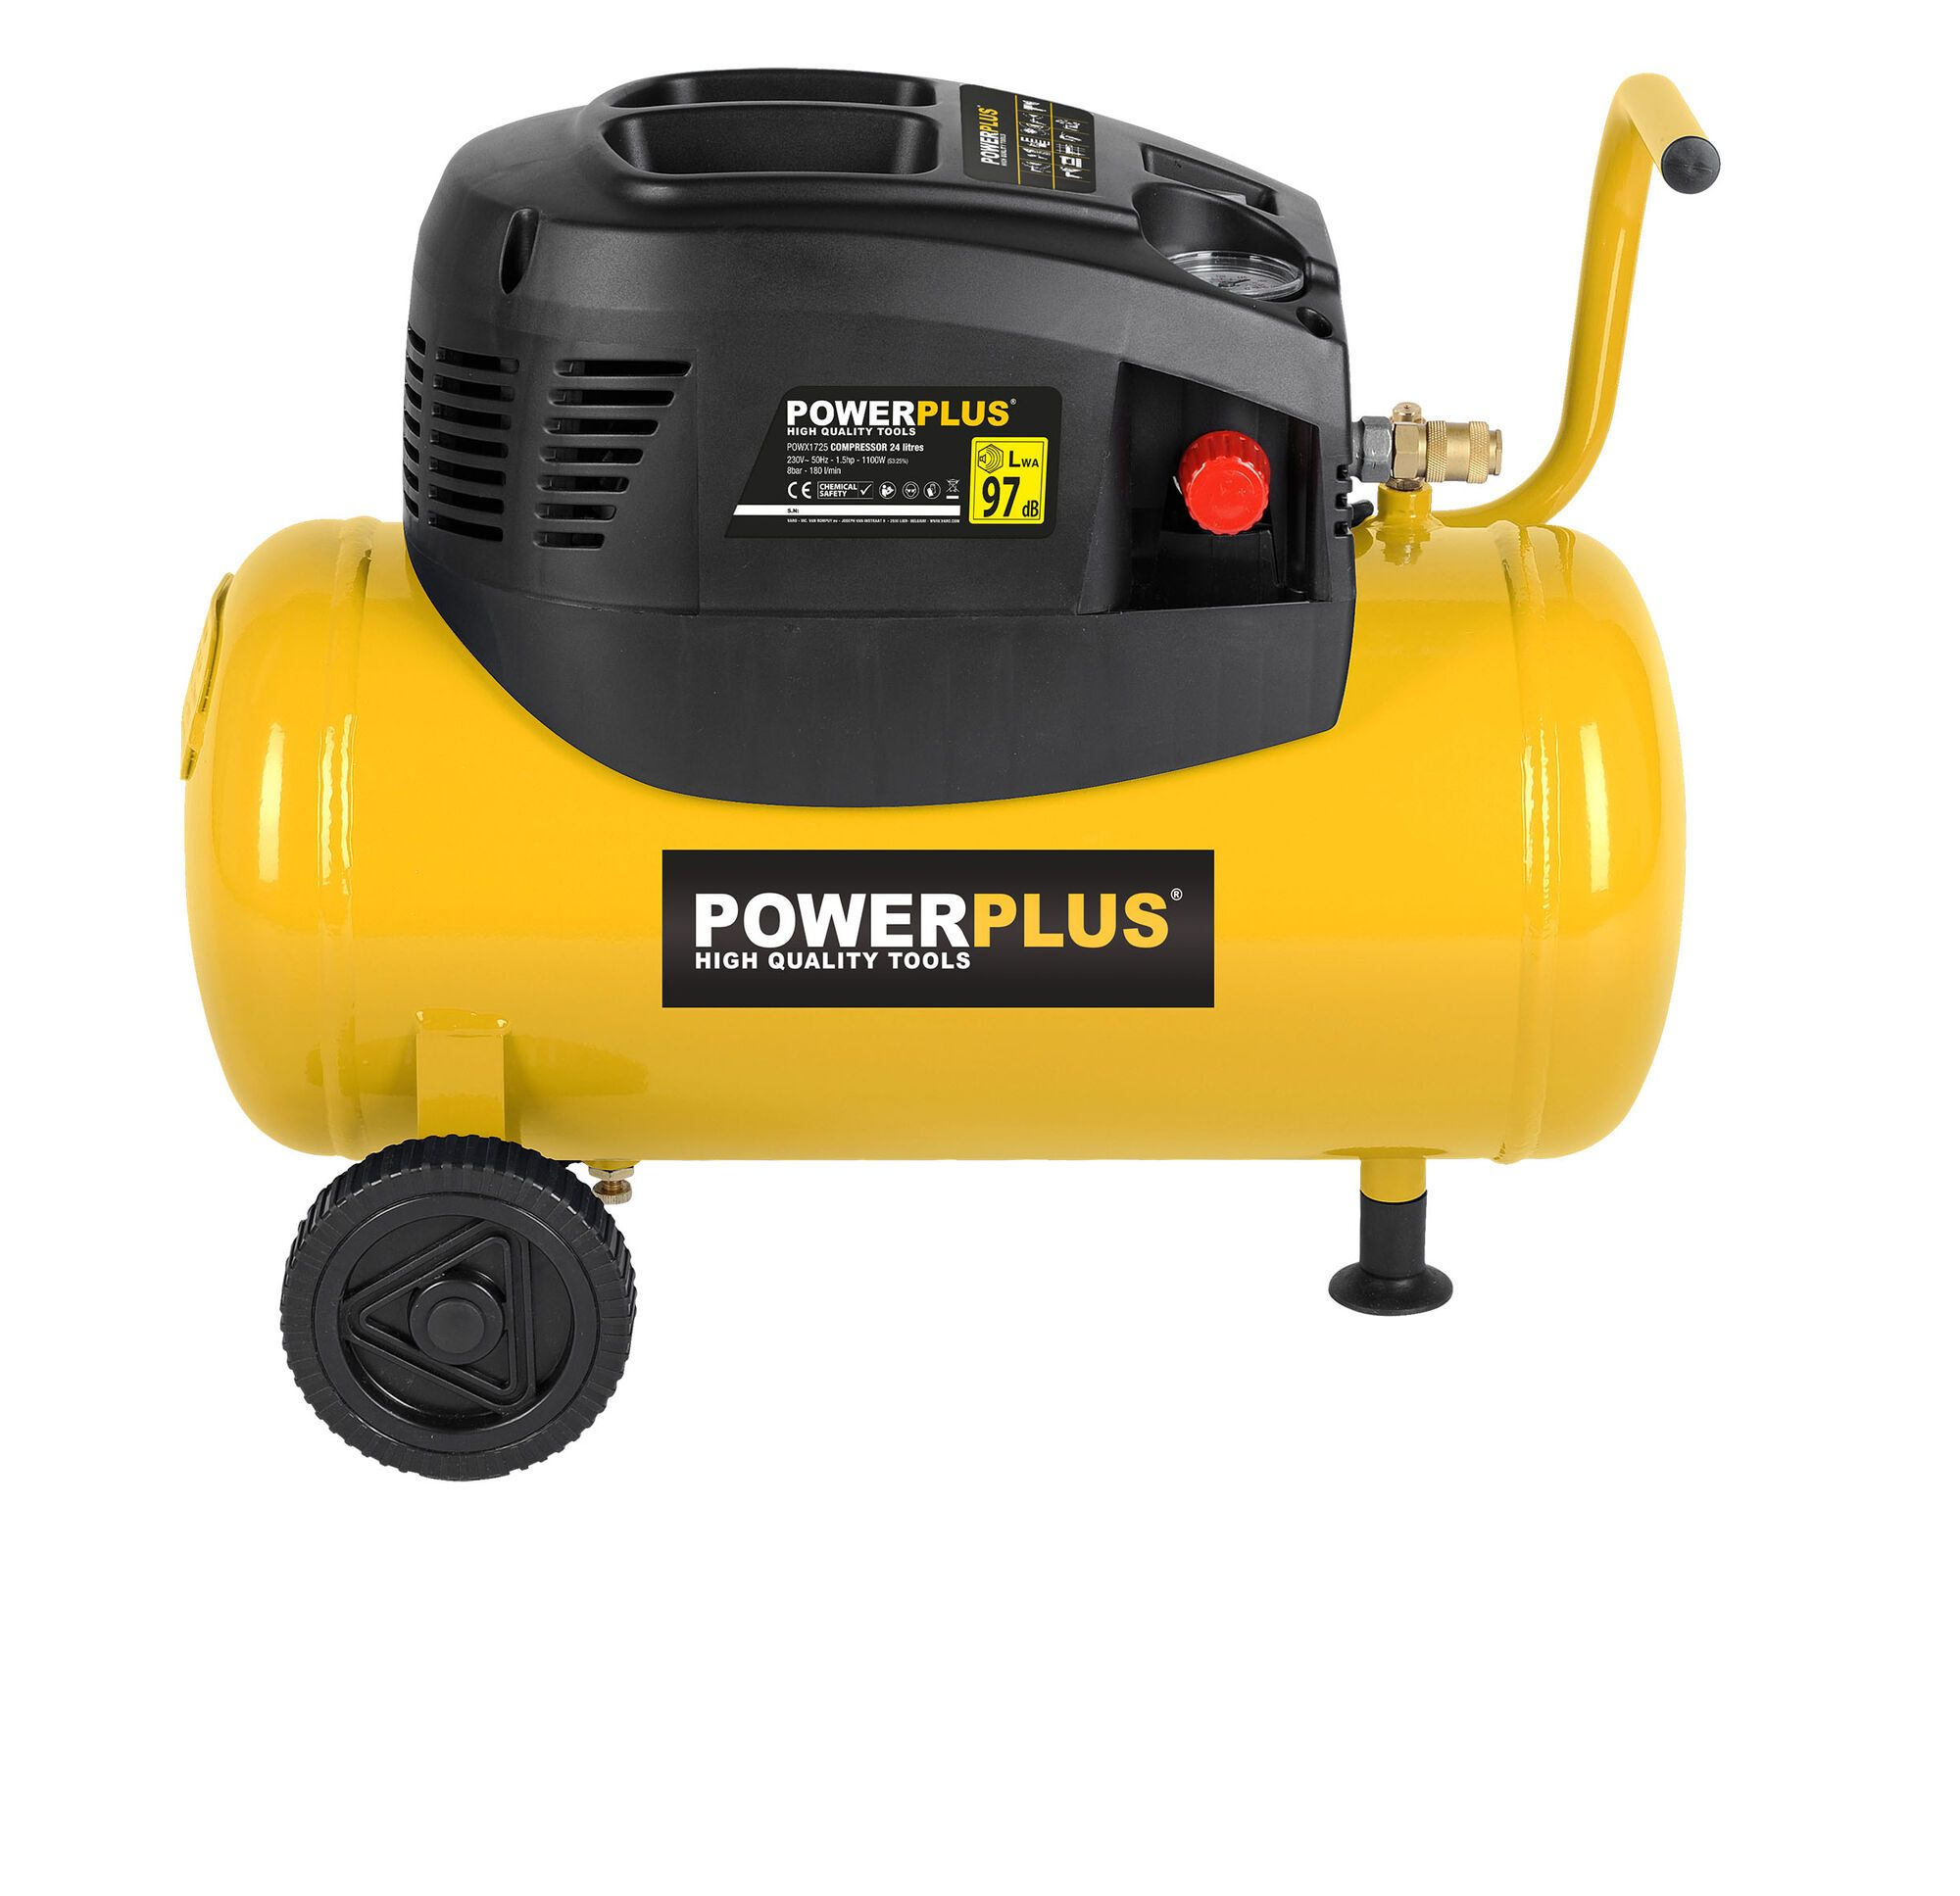 Powerplus POWX1725 Mobiele 1100W olievrije compressor met 24 liter tank